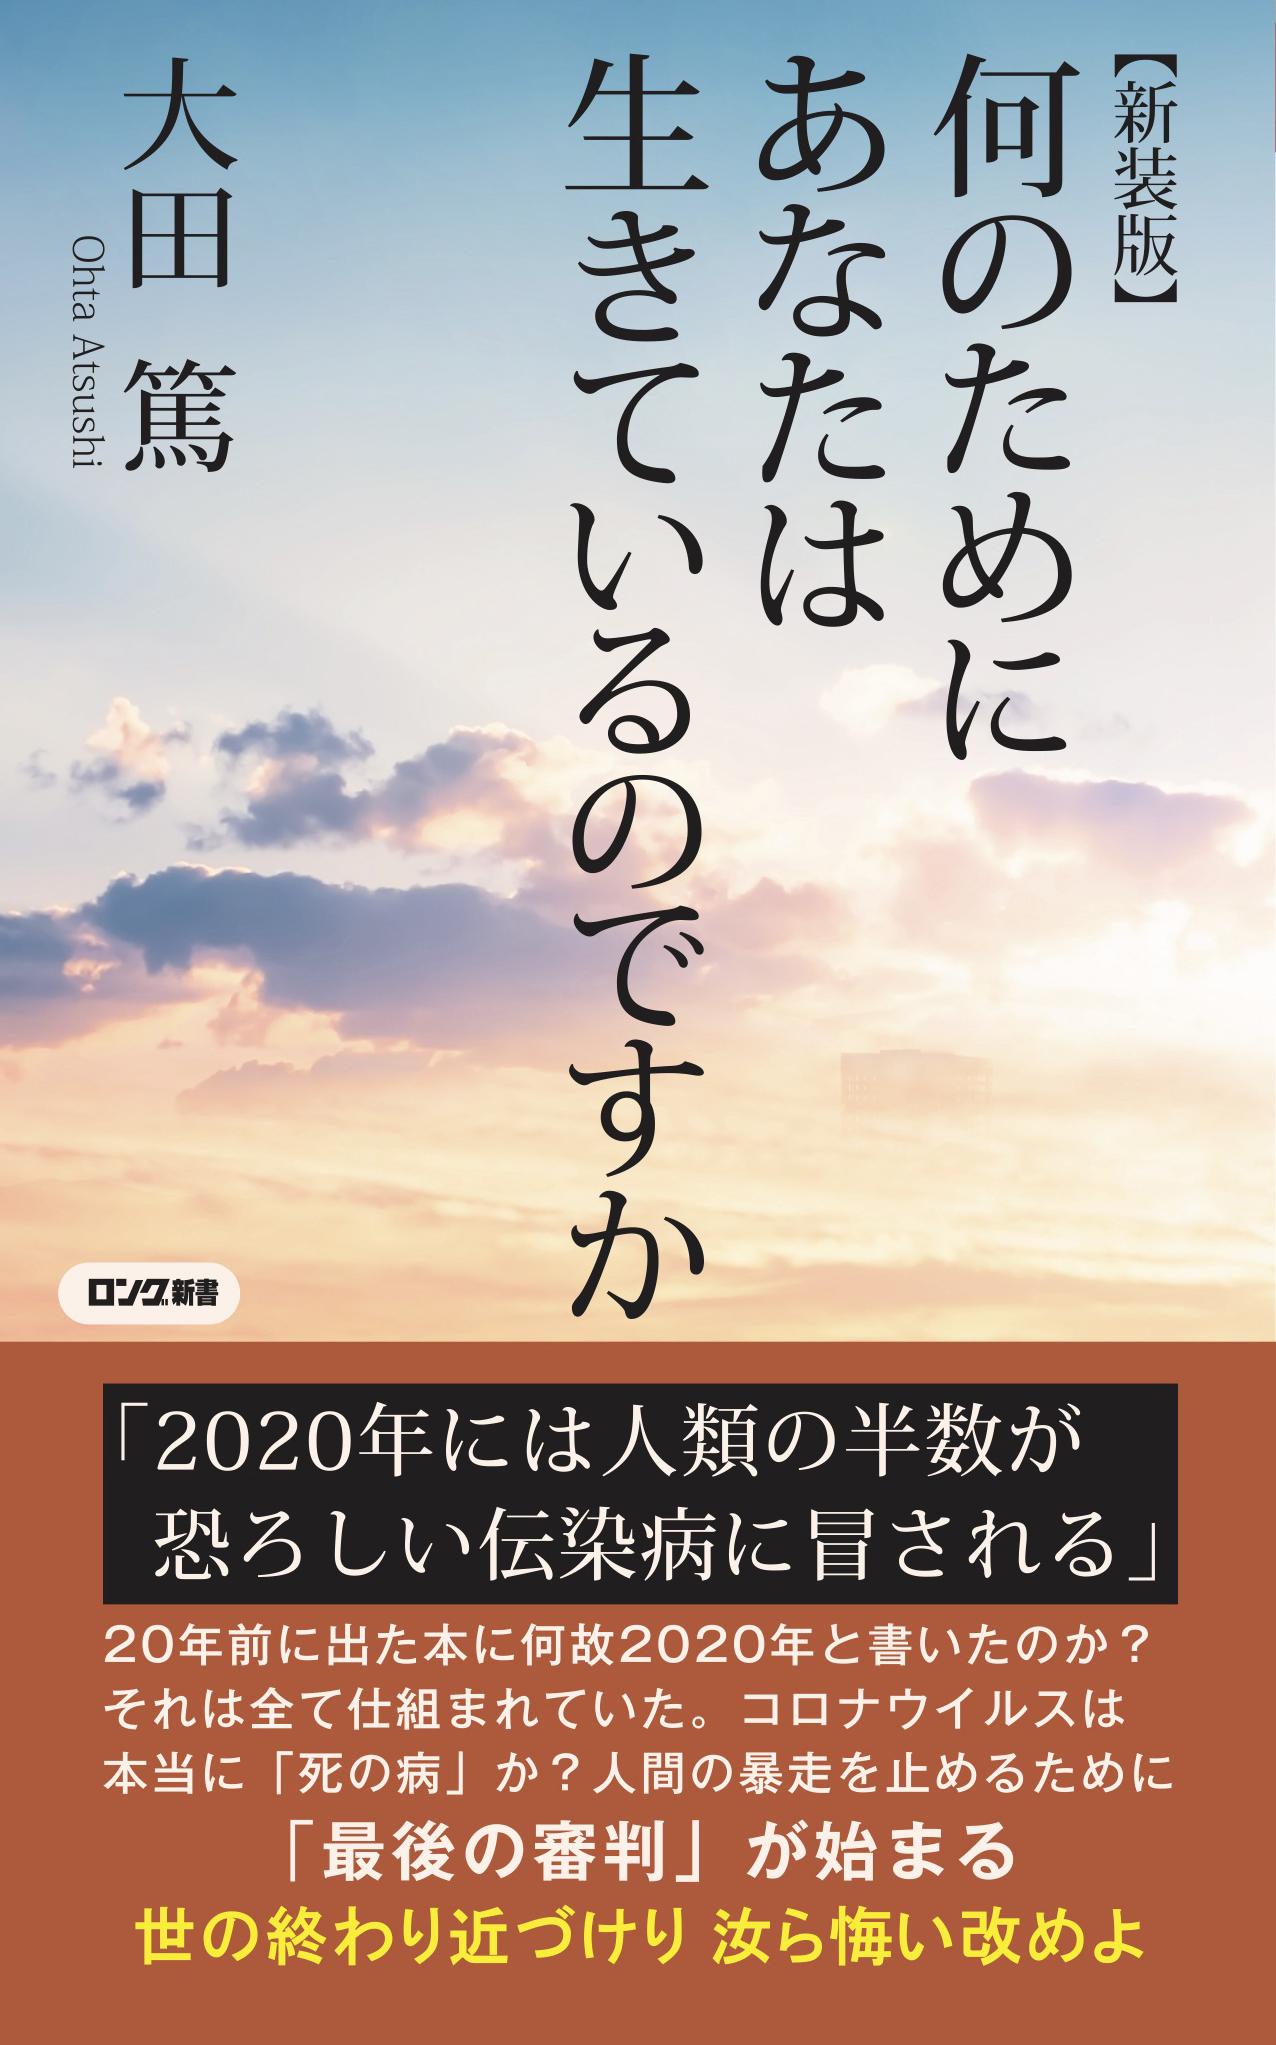 202009-3